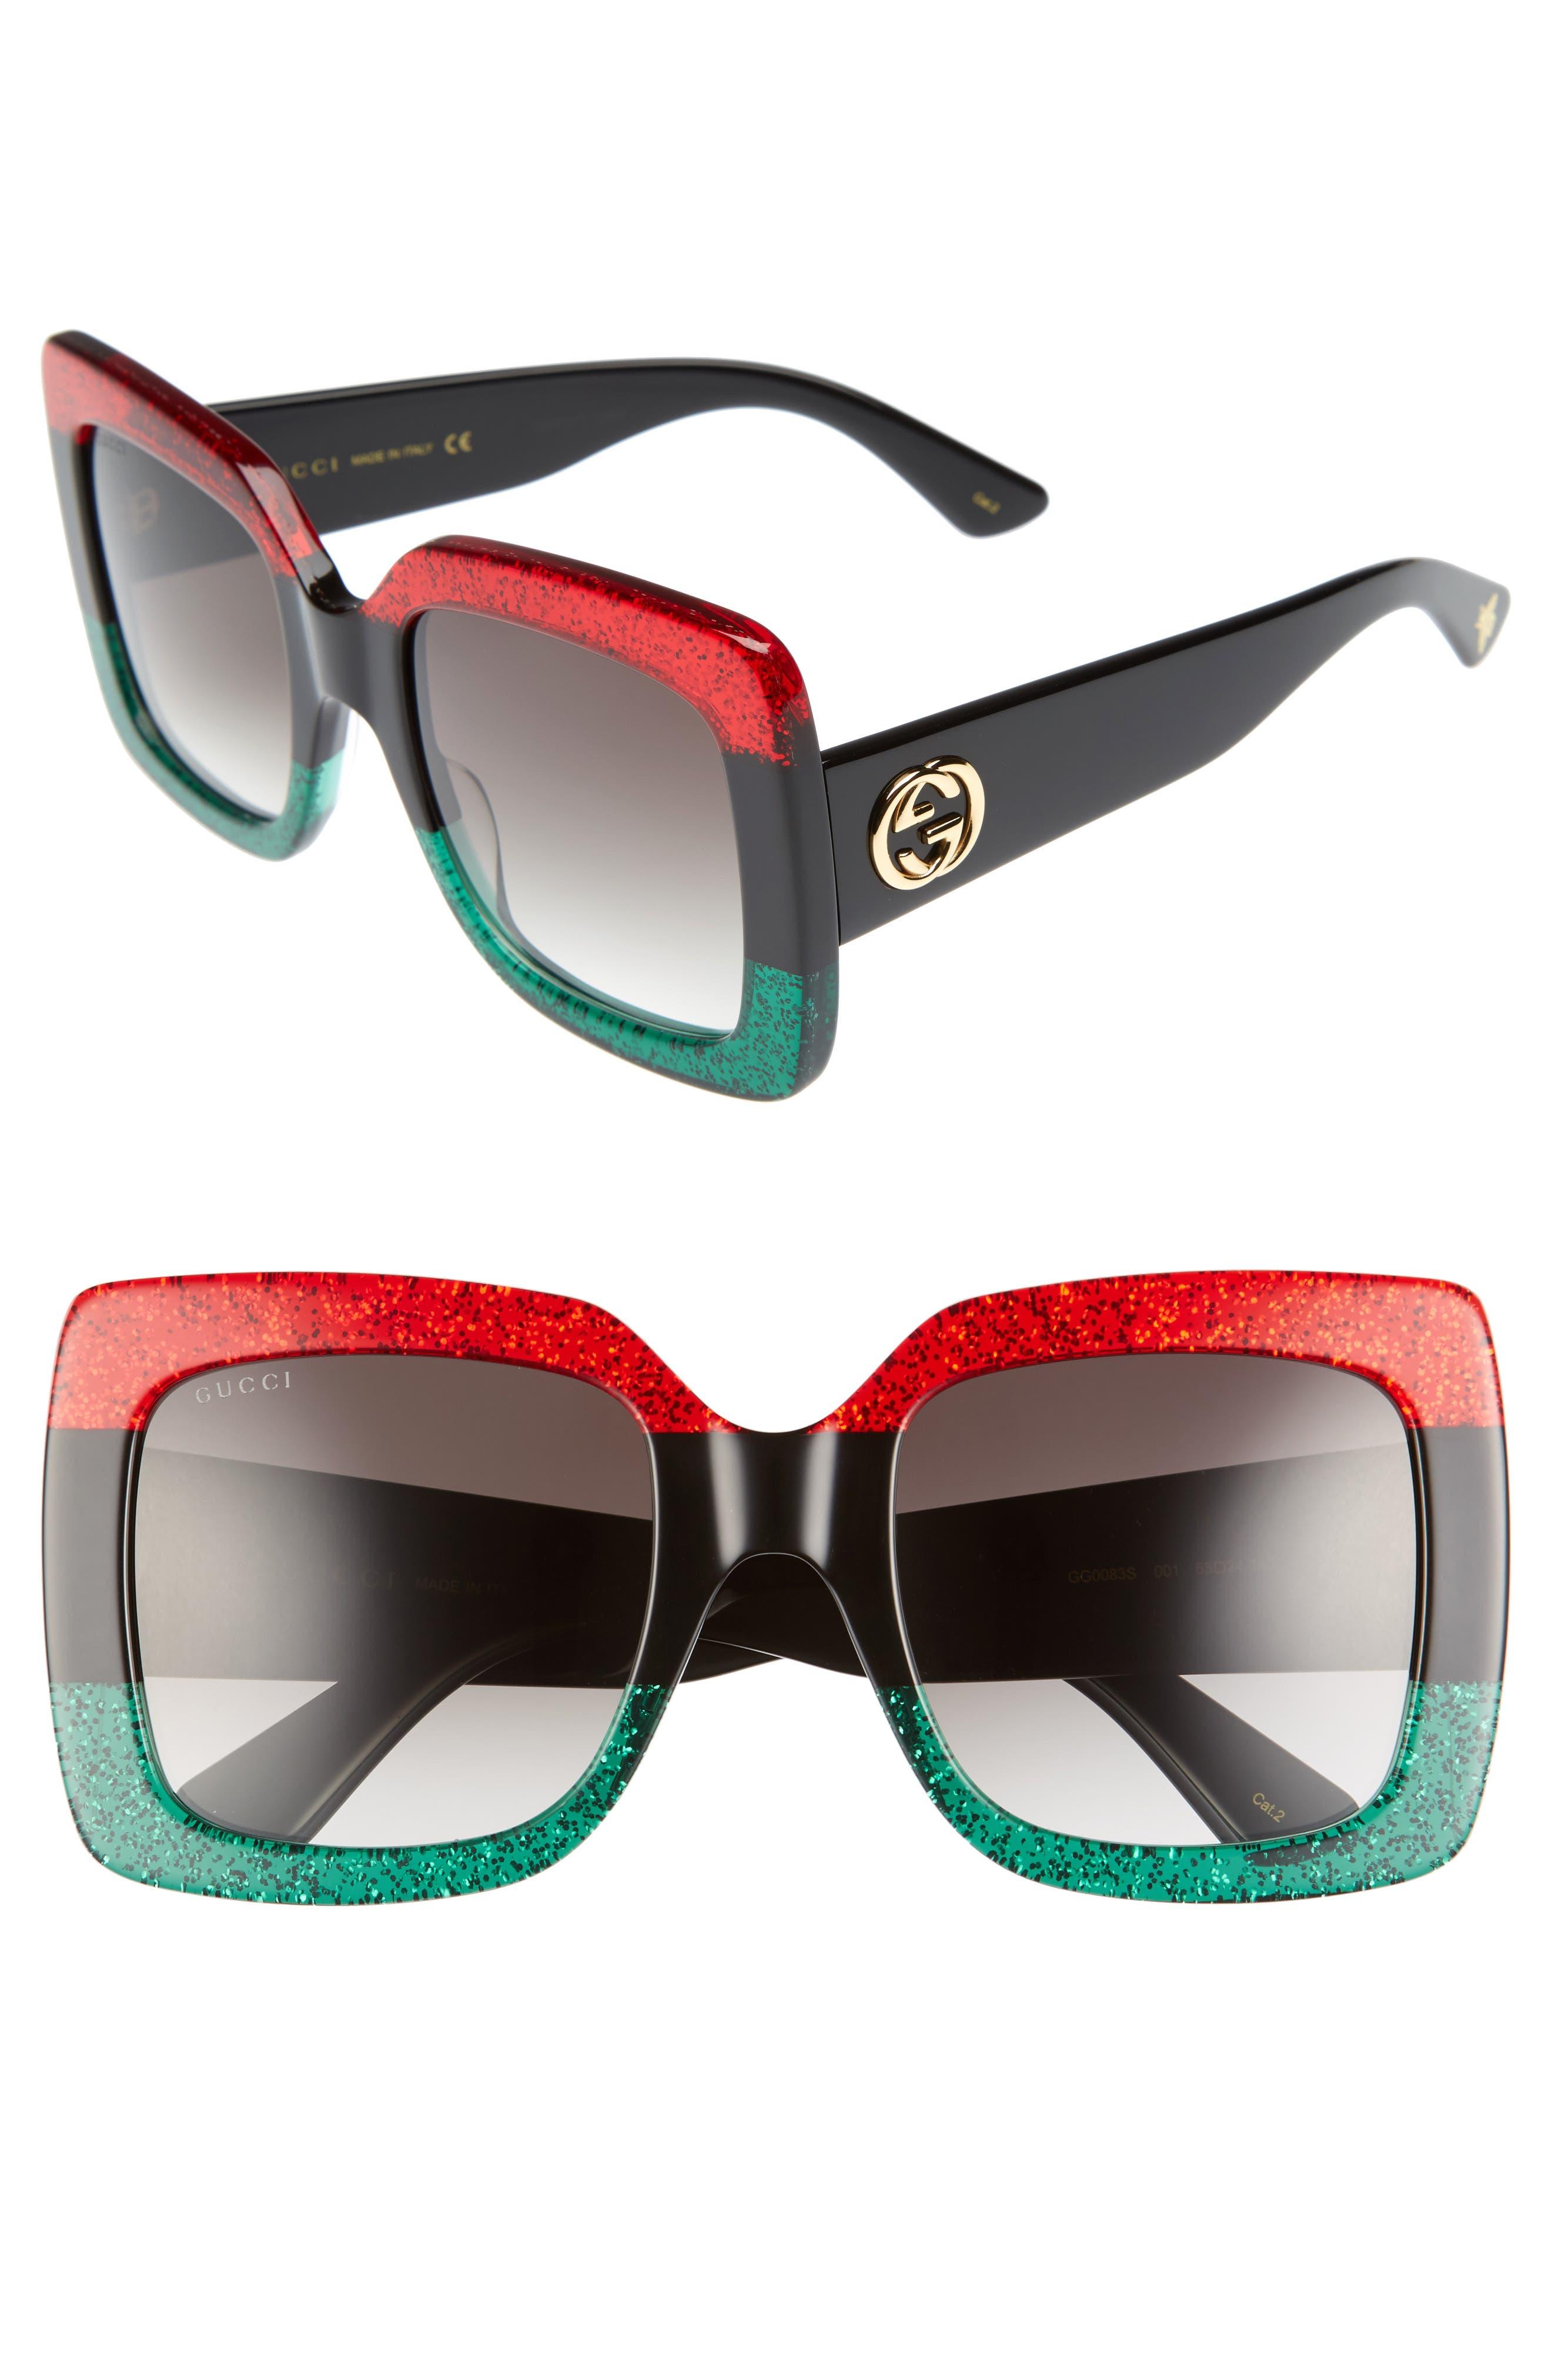 GUCCI 55mm Square Sunglasses, Main, color, RED BLACK GREEN/ GREY